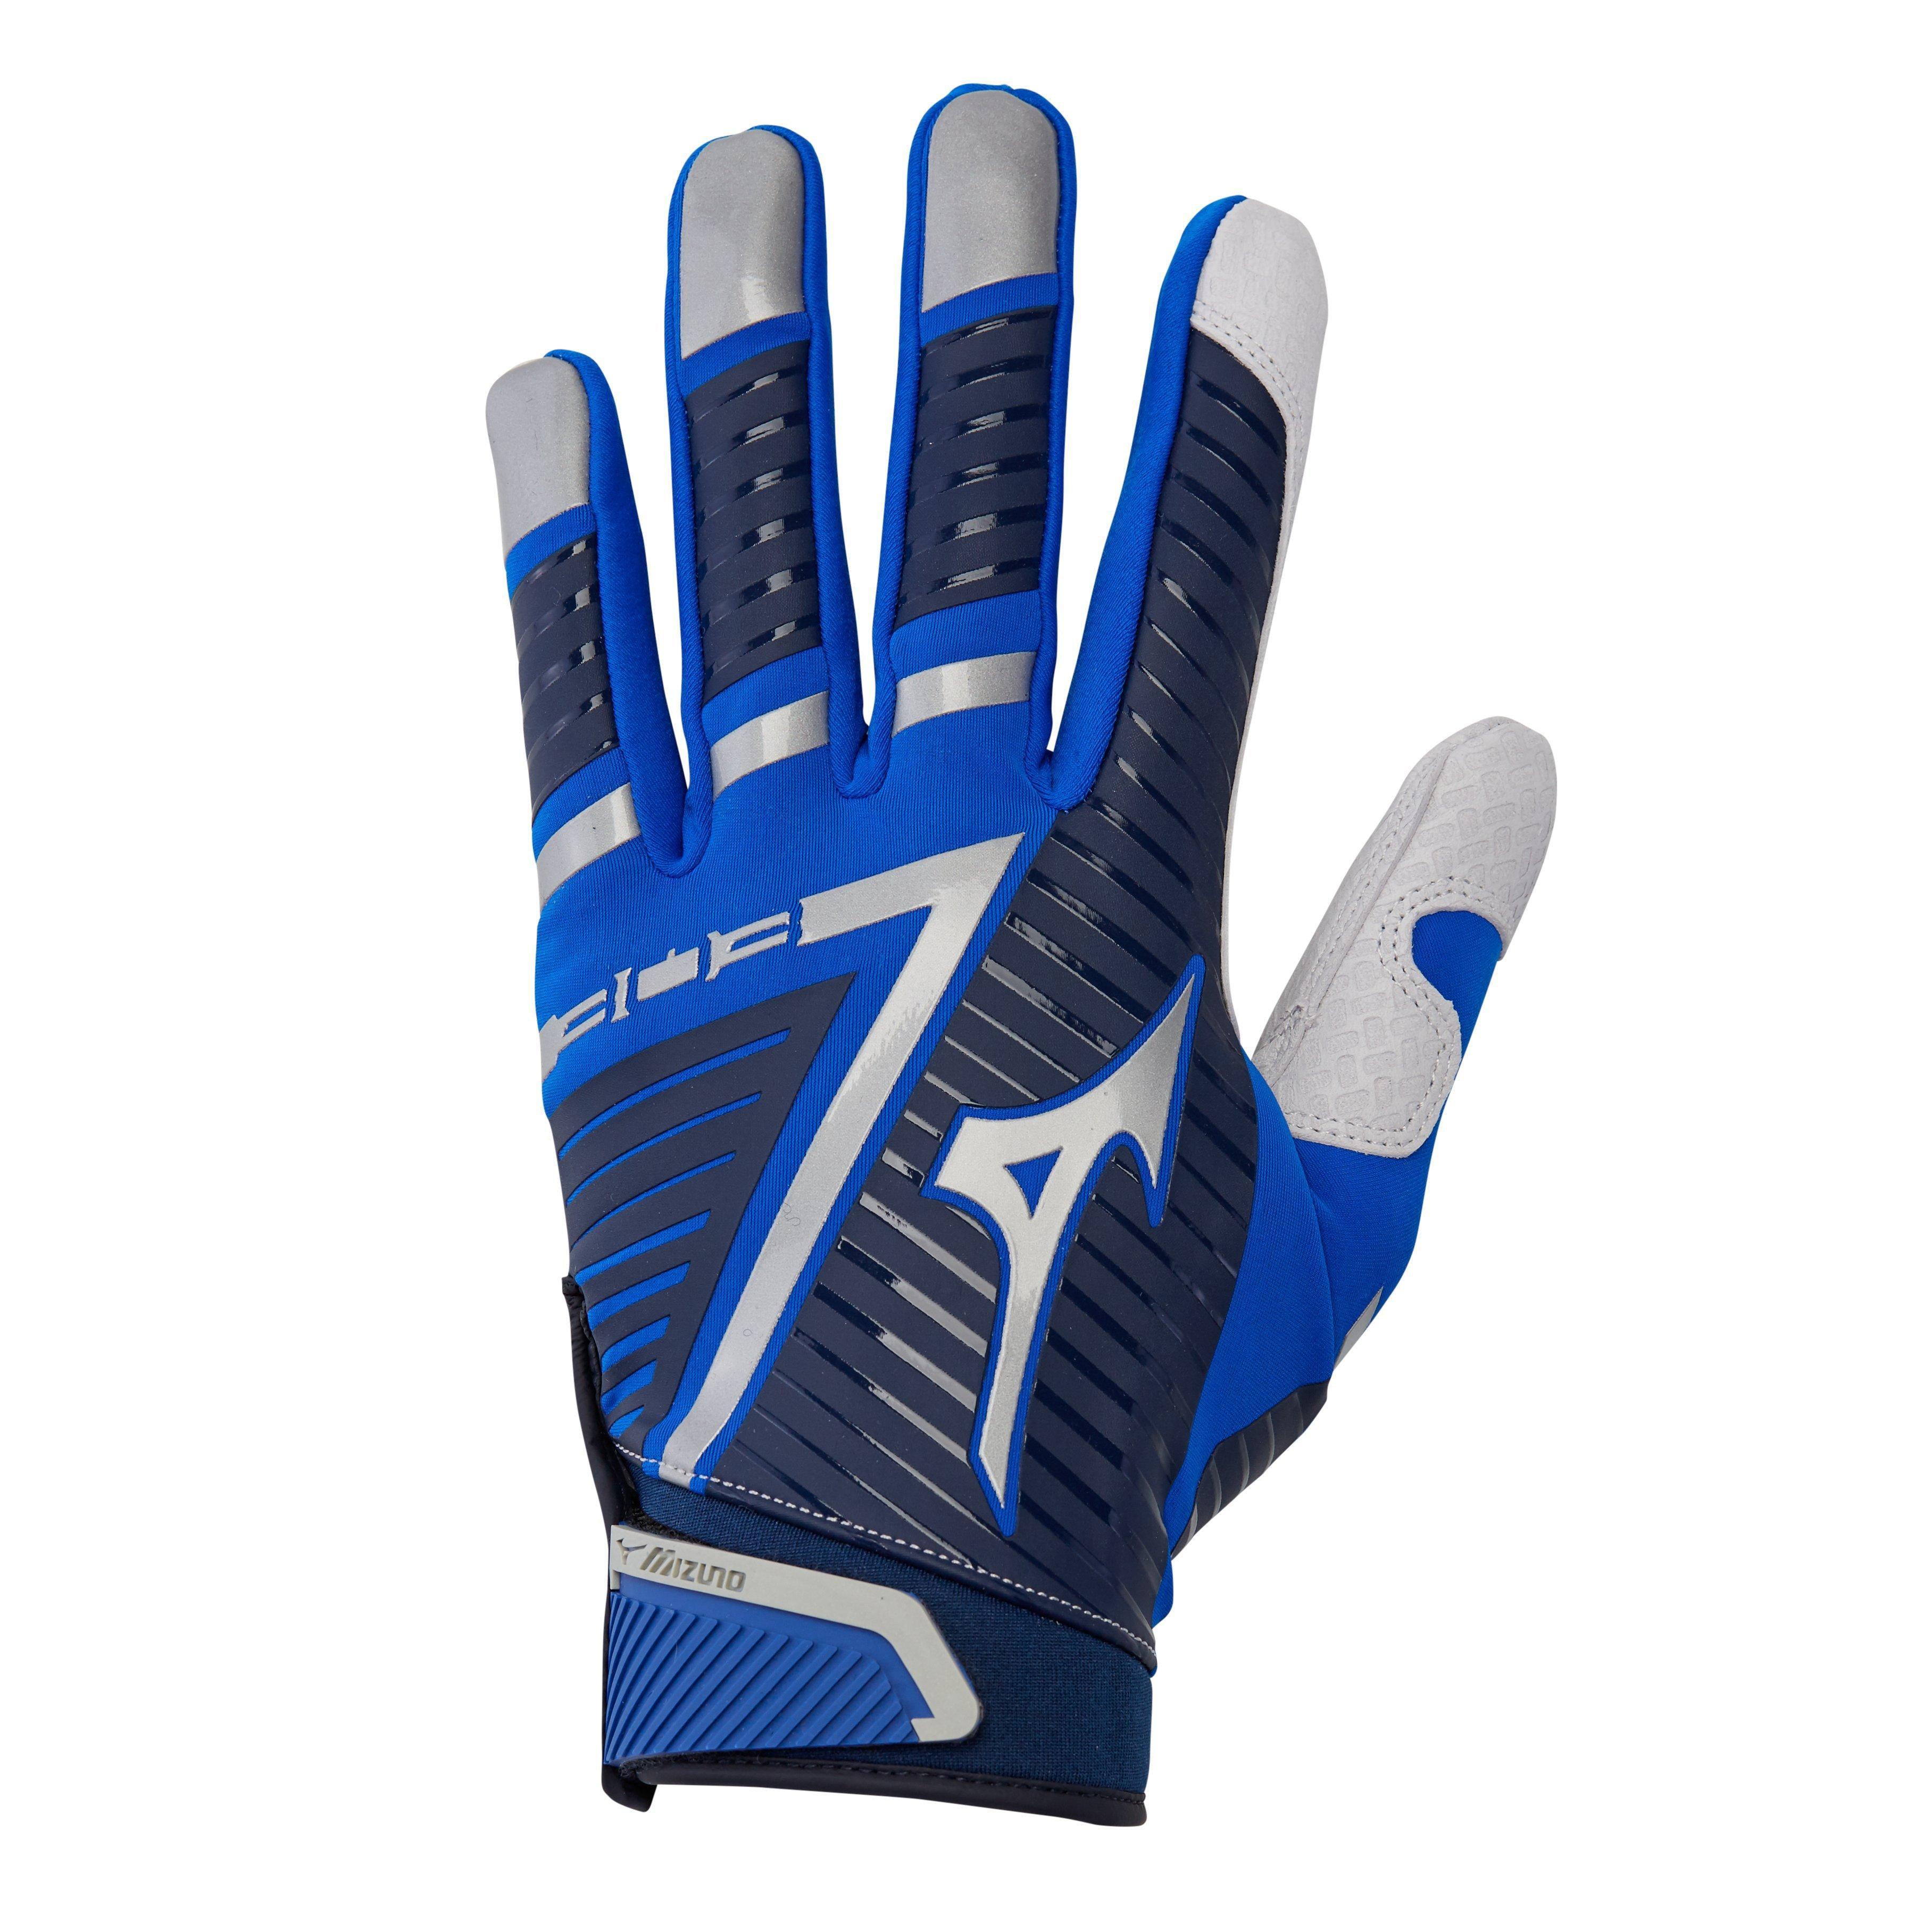 B-303 Adult Baseball Batting Glove